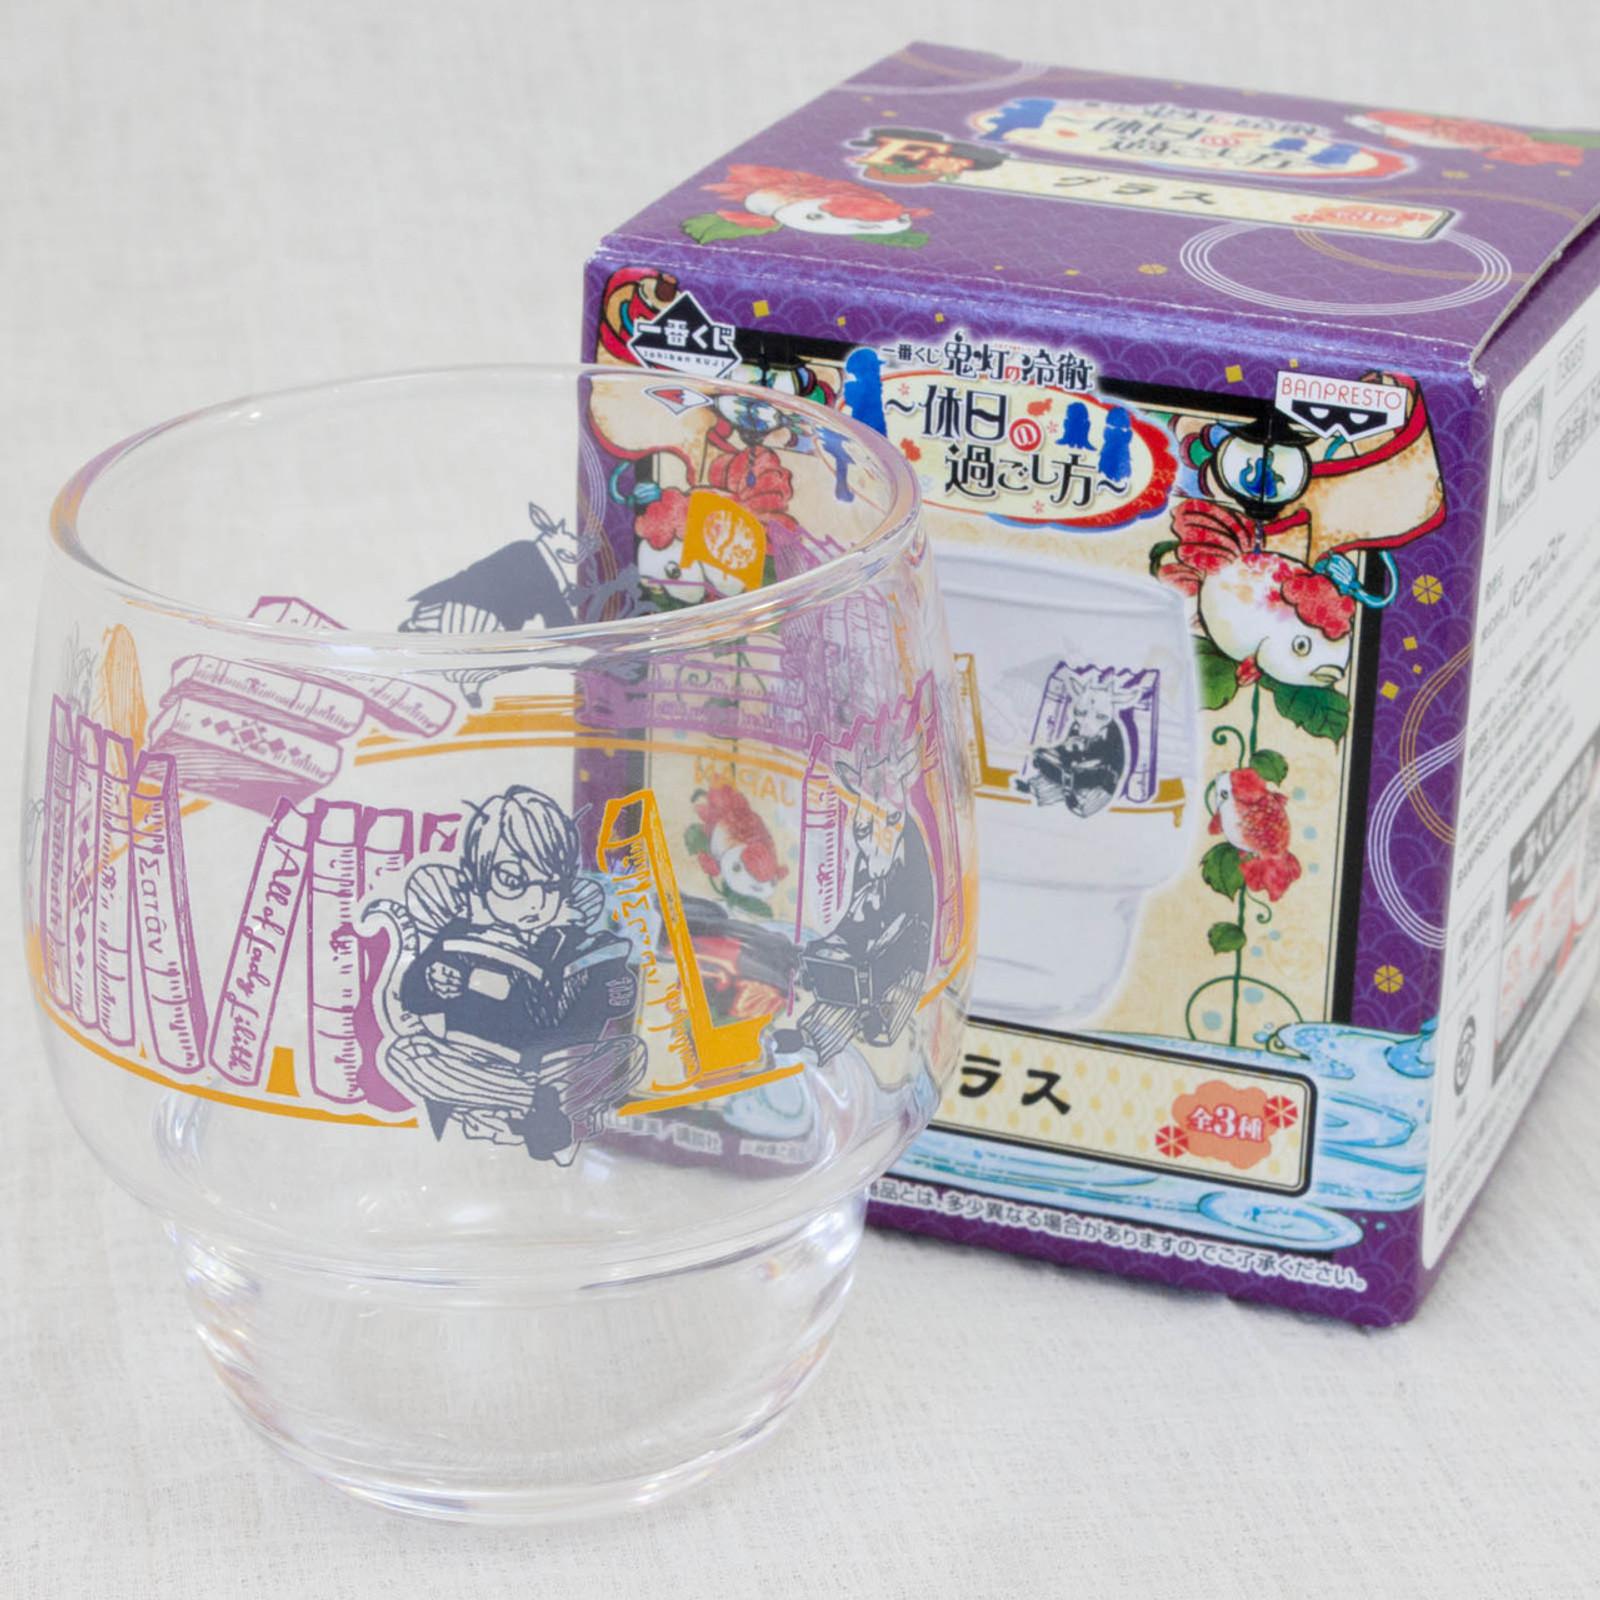 Hozuki no Reitetsu Glass Beelzebub Ver. Banpresto JAPAN ANIME MANGA